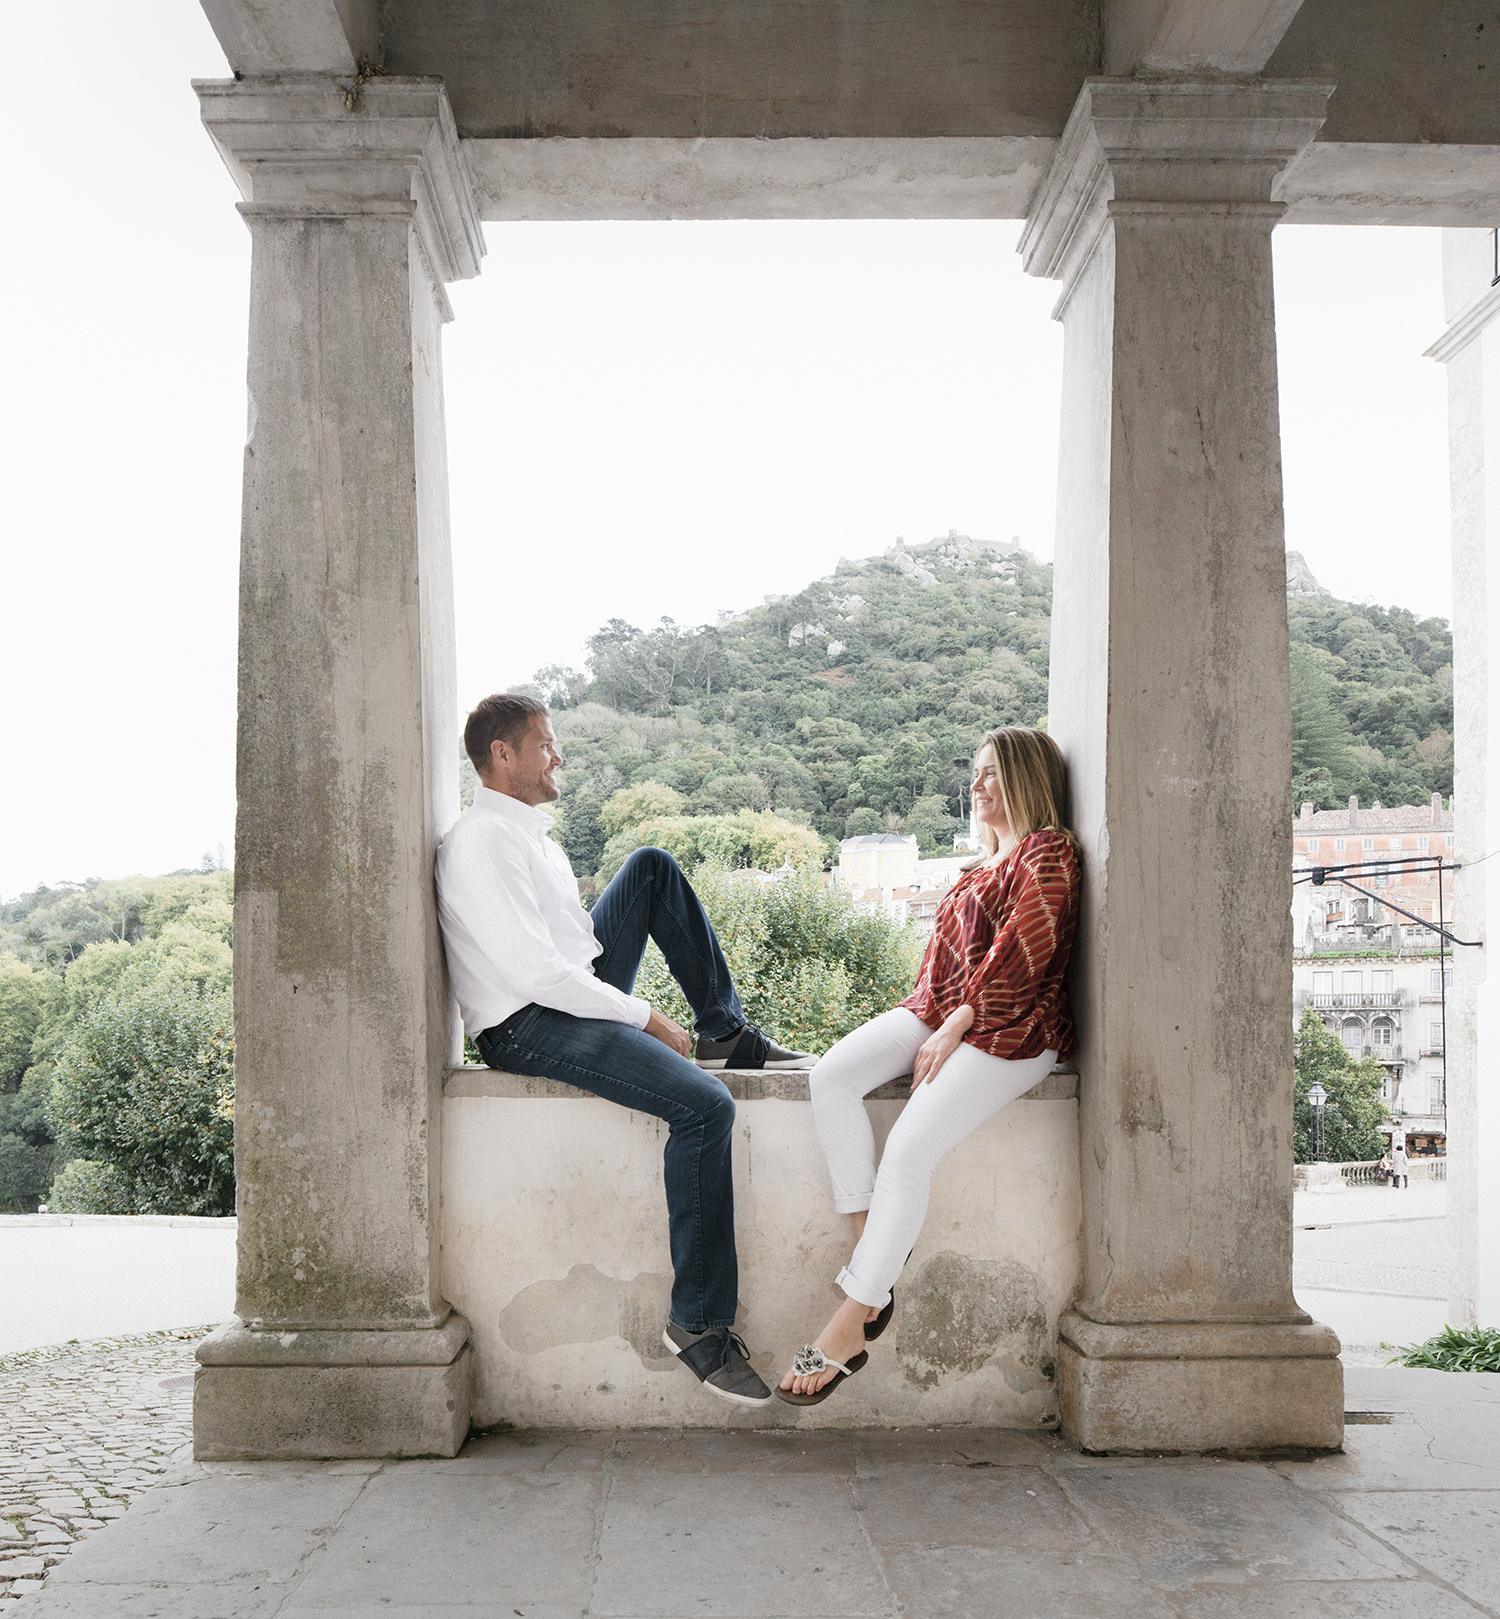 sessao-fotografica-casal-sintra-portugal-flytographer-terra-fotografia-15.jpg